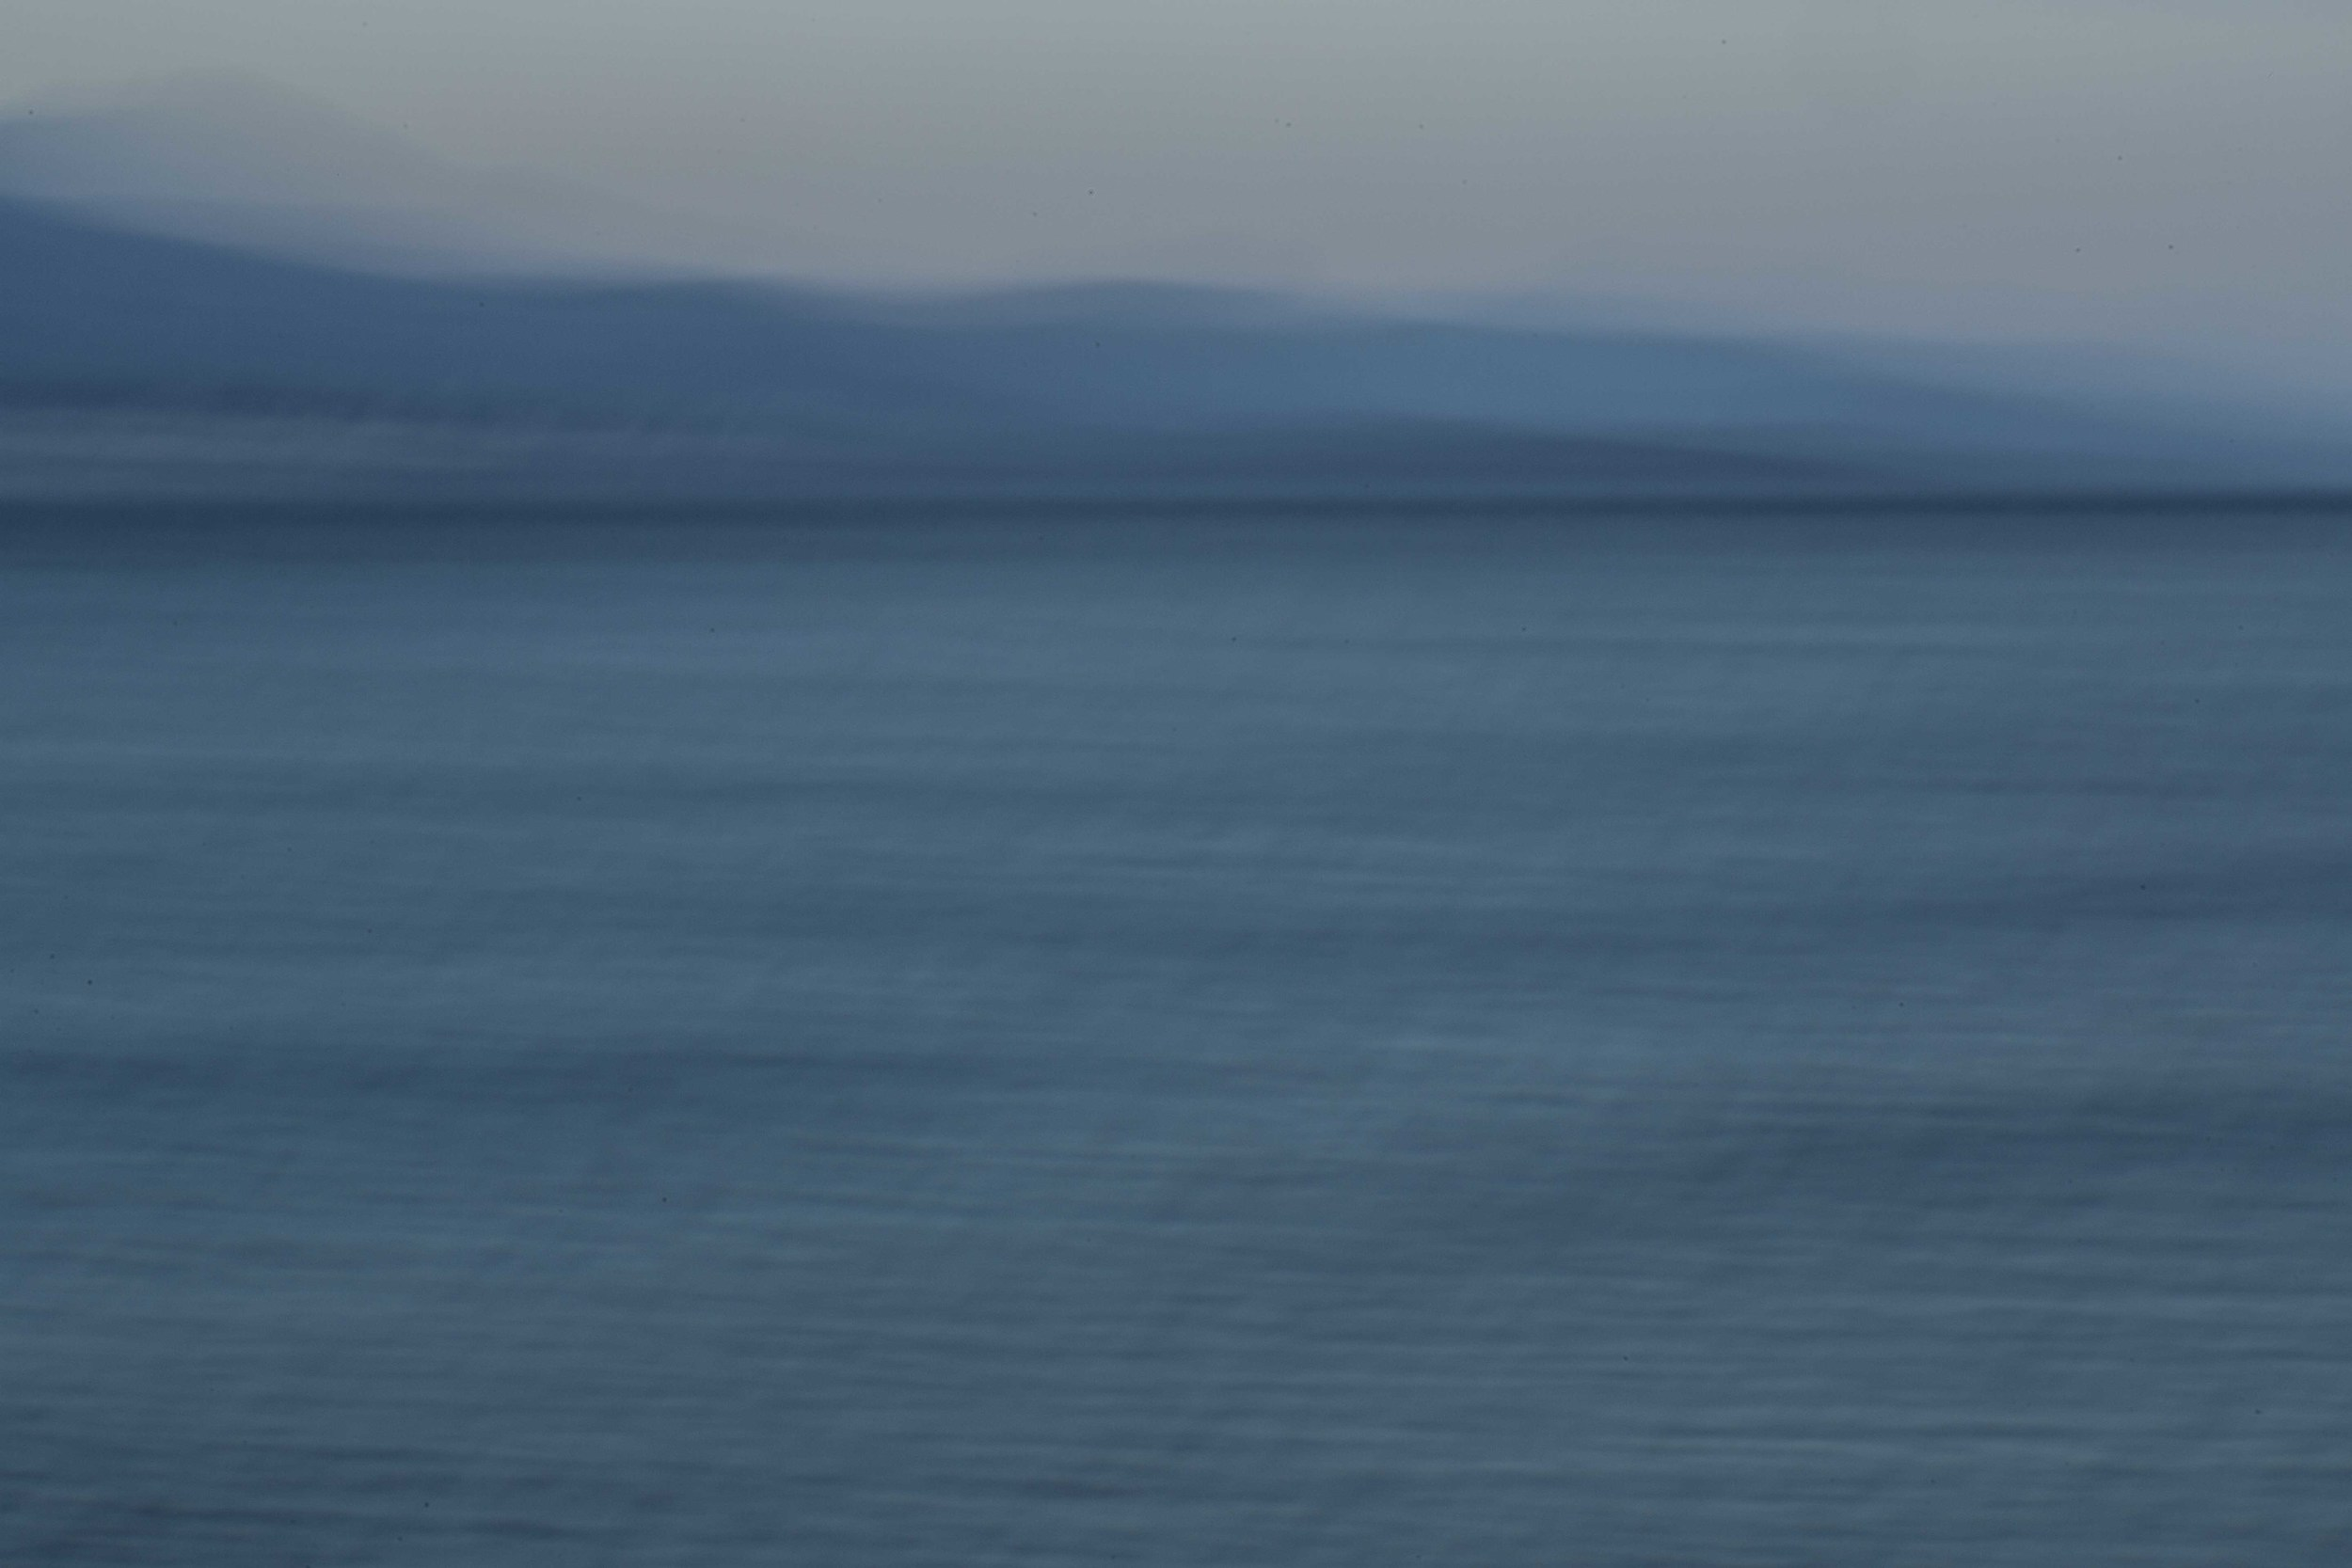 Mediterranean12.jpg